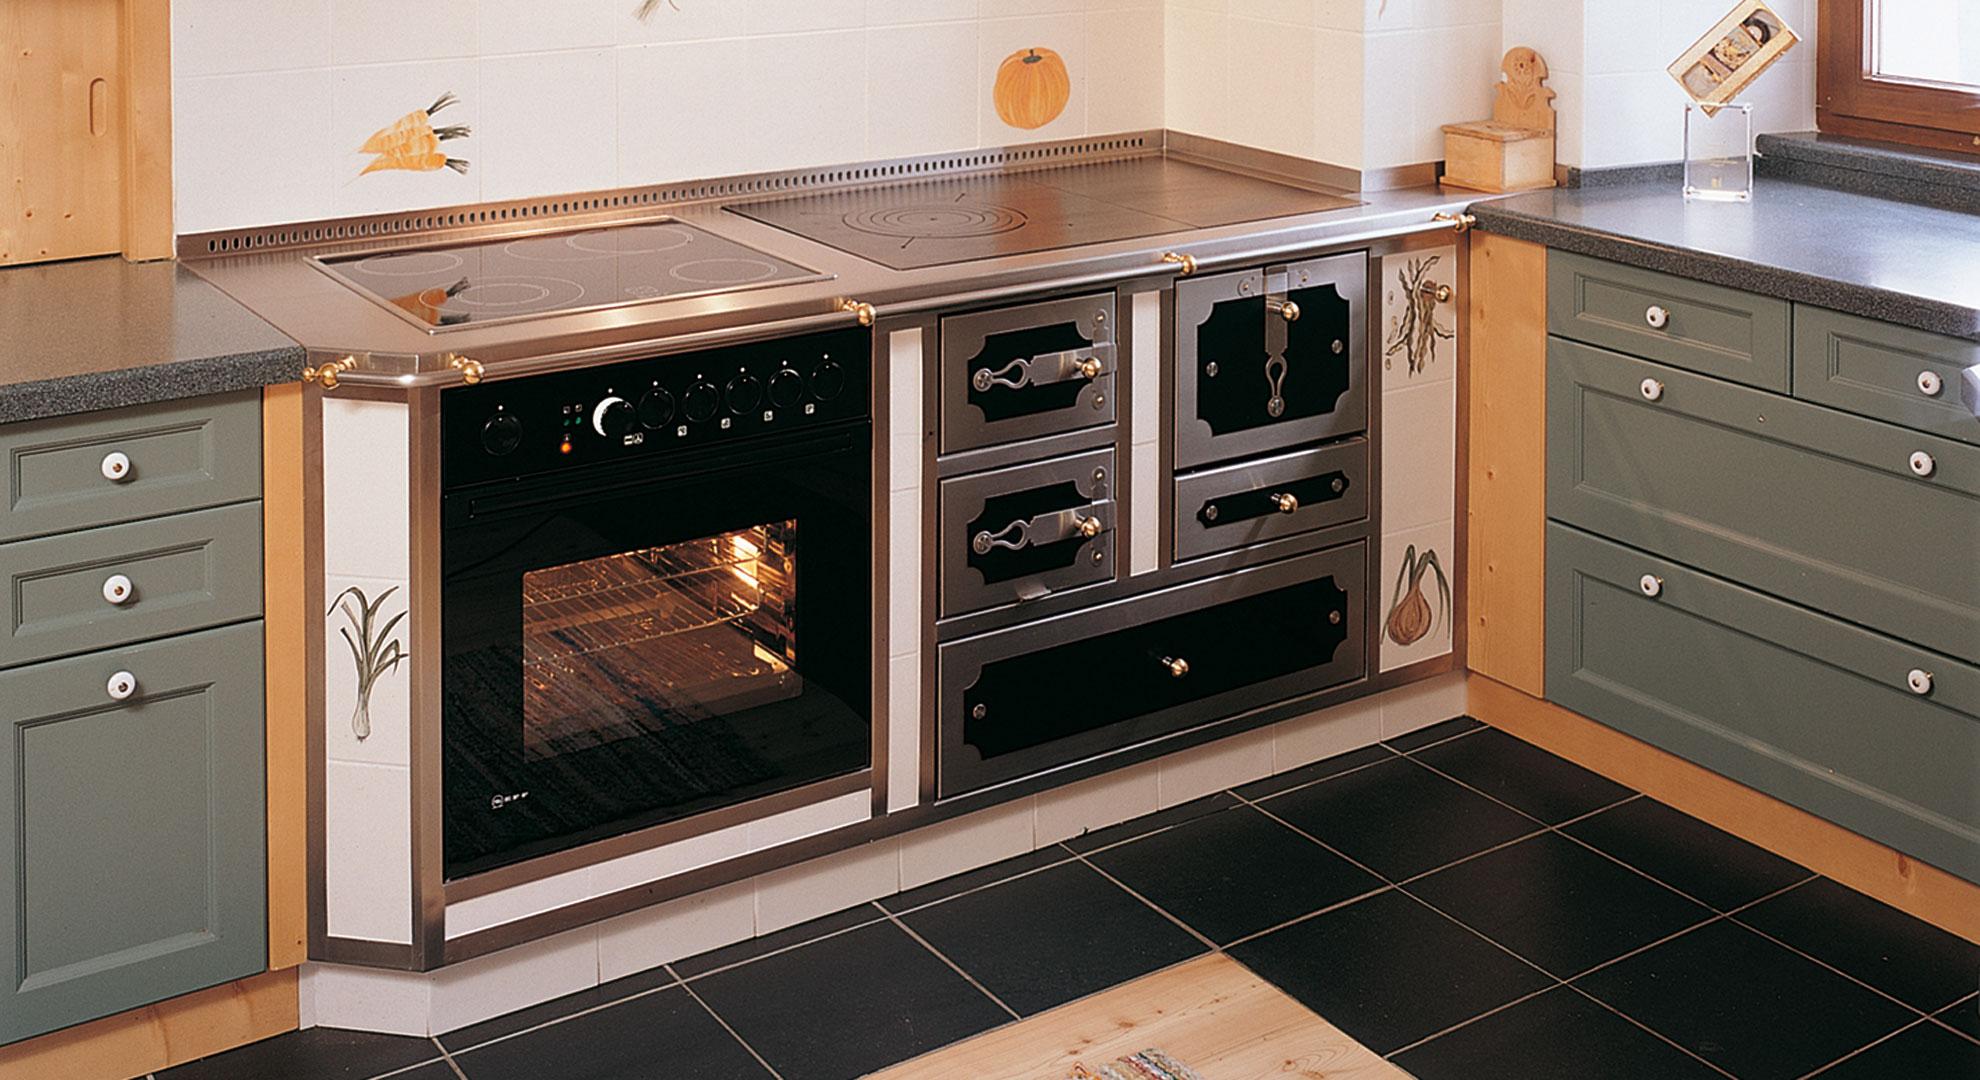 Einbauherde  Ofenbau Koller - Einbauherde